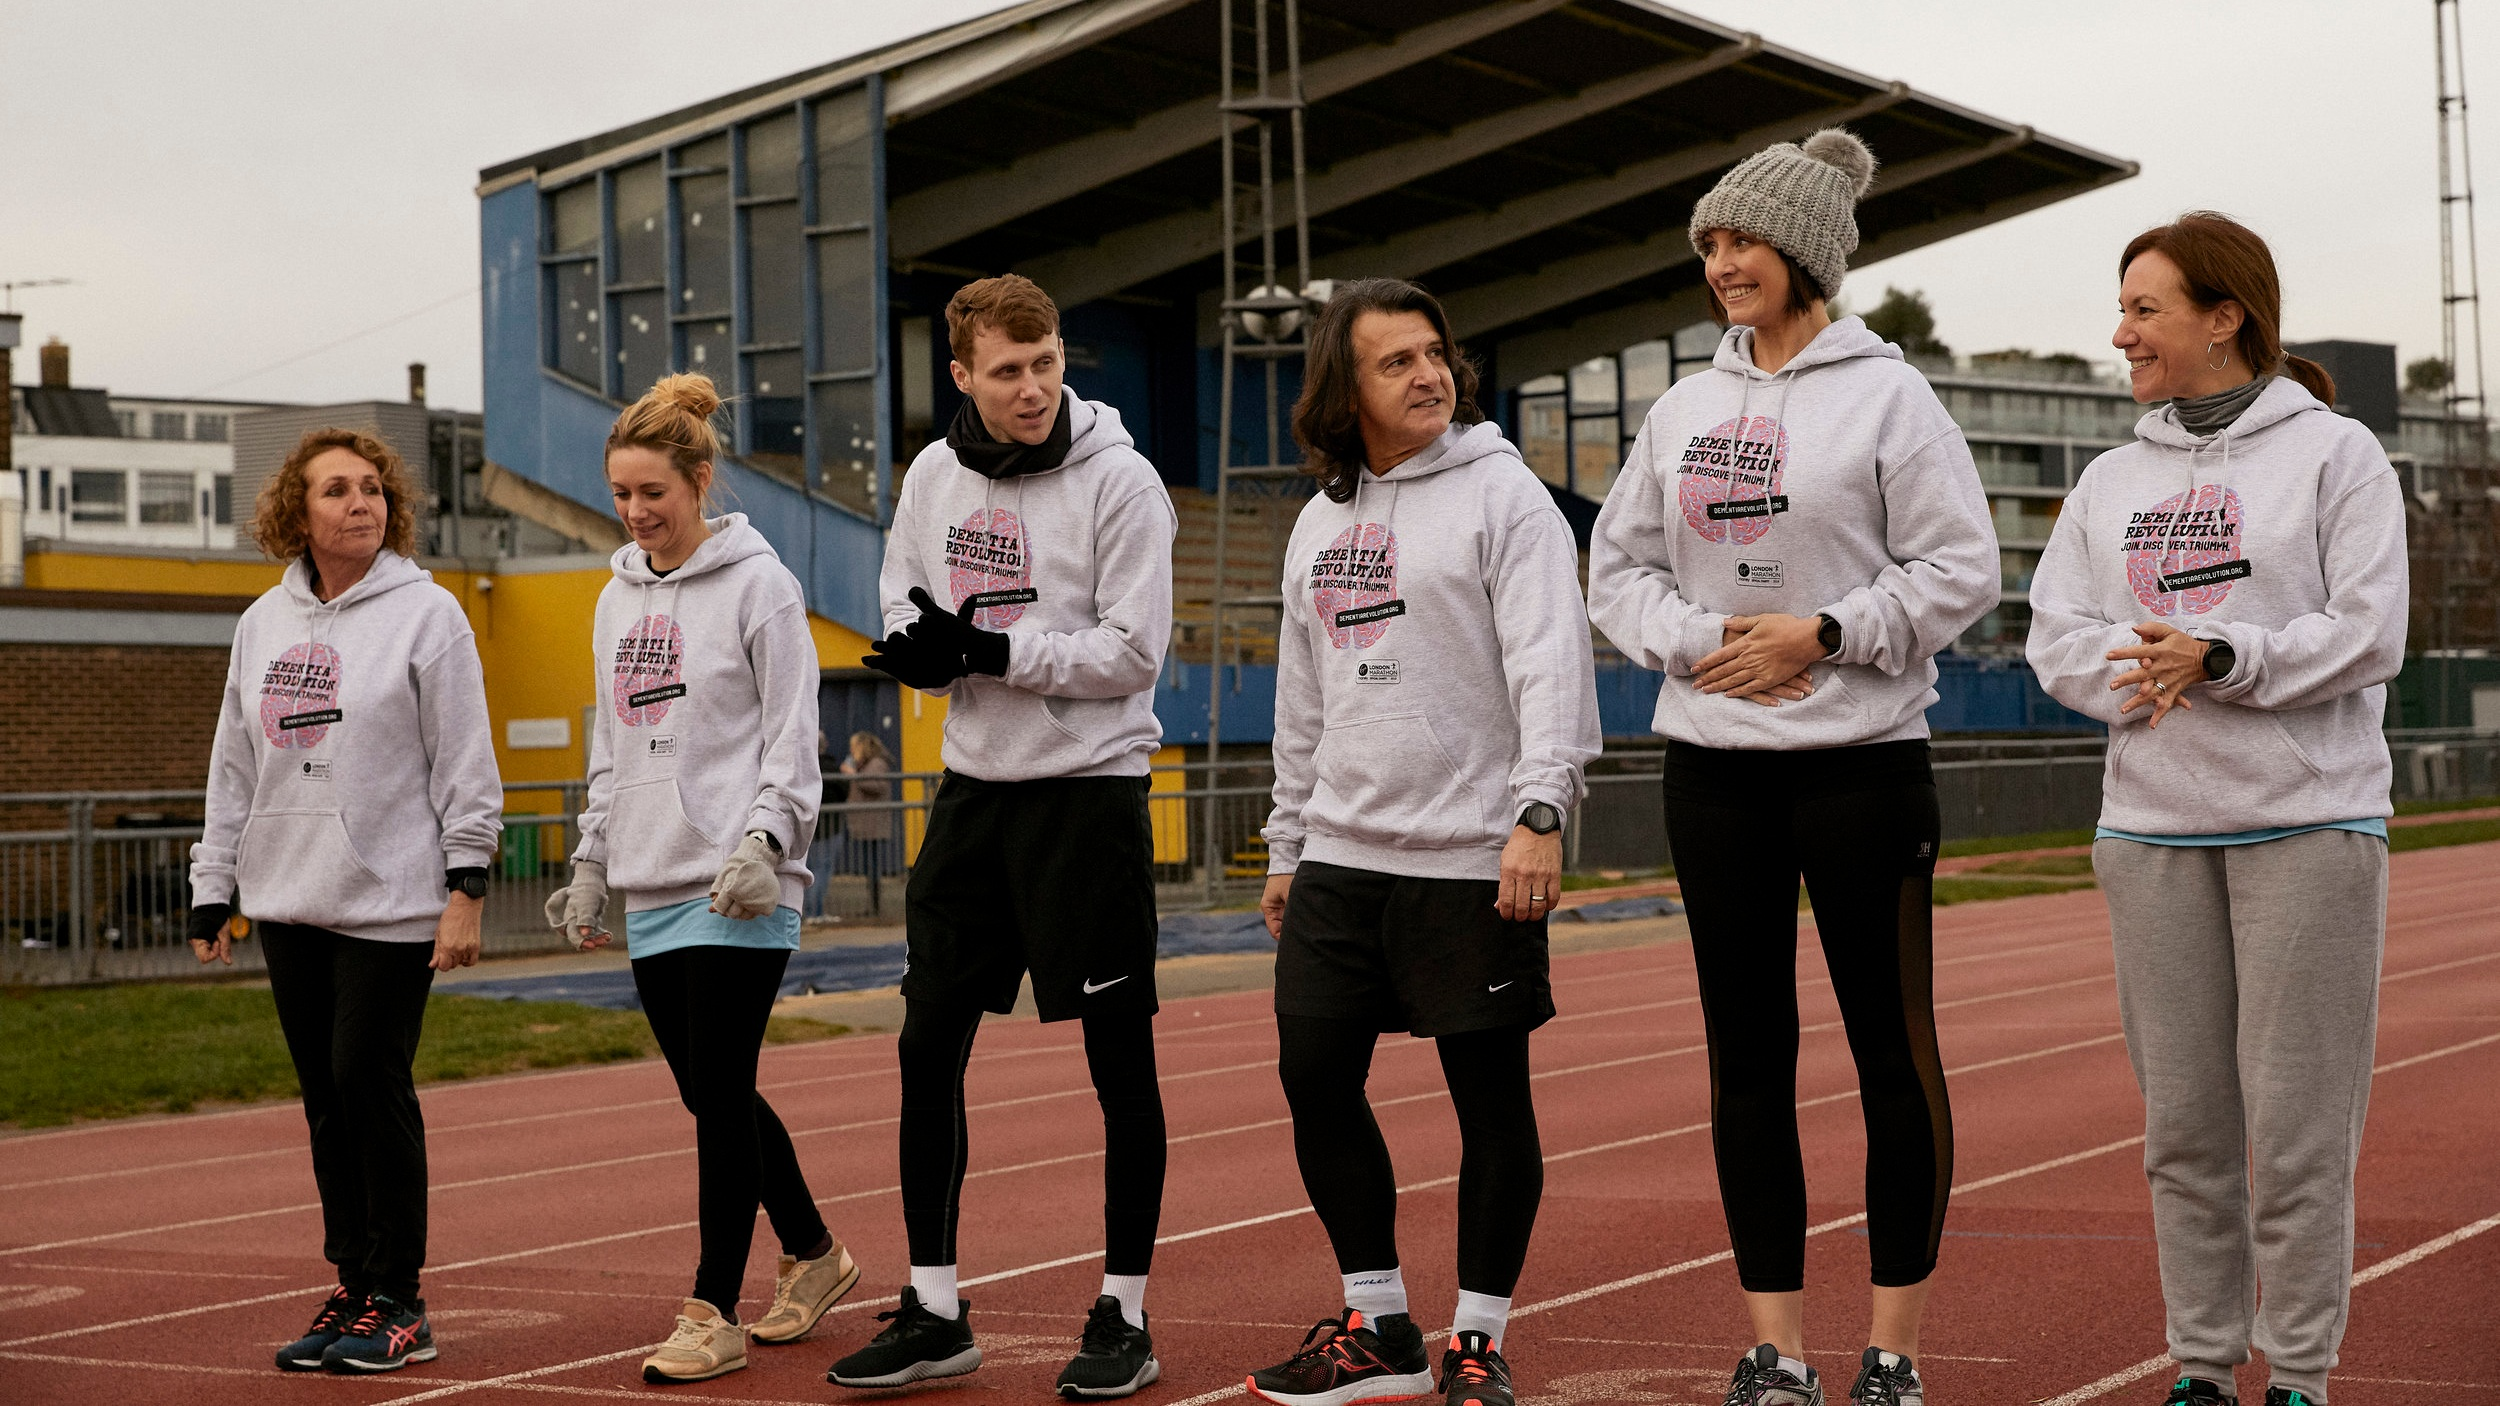 Left to right: Jane Slaughter, Kellie Shirley, Jamie Borthwick, Scott Mitchell, Emma Barton, Tanya Franks